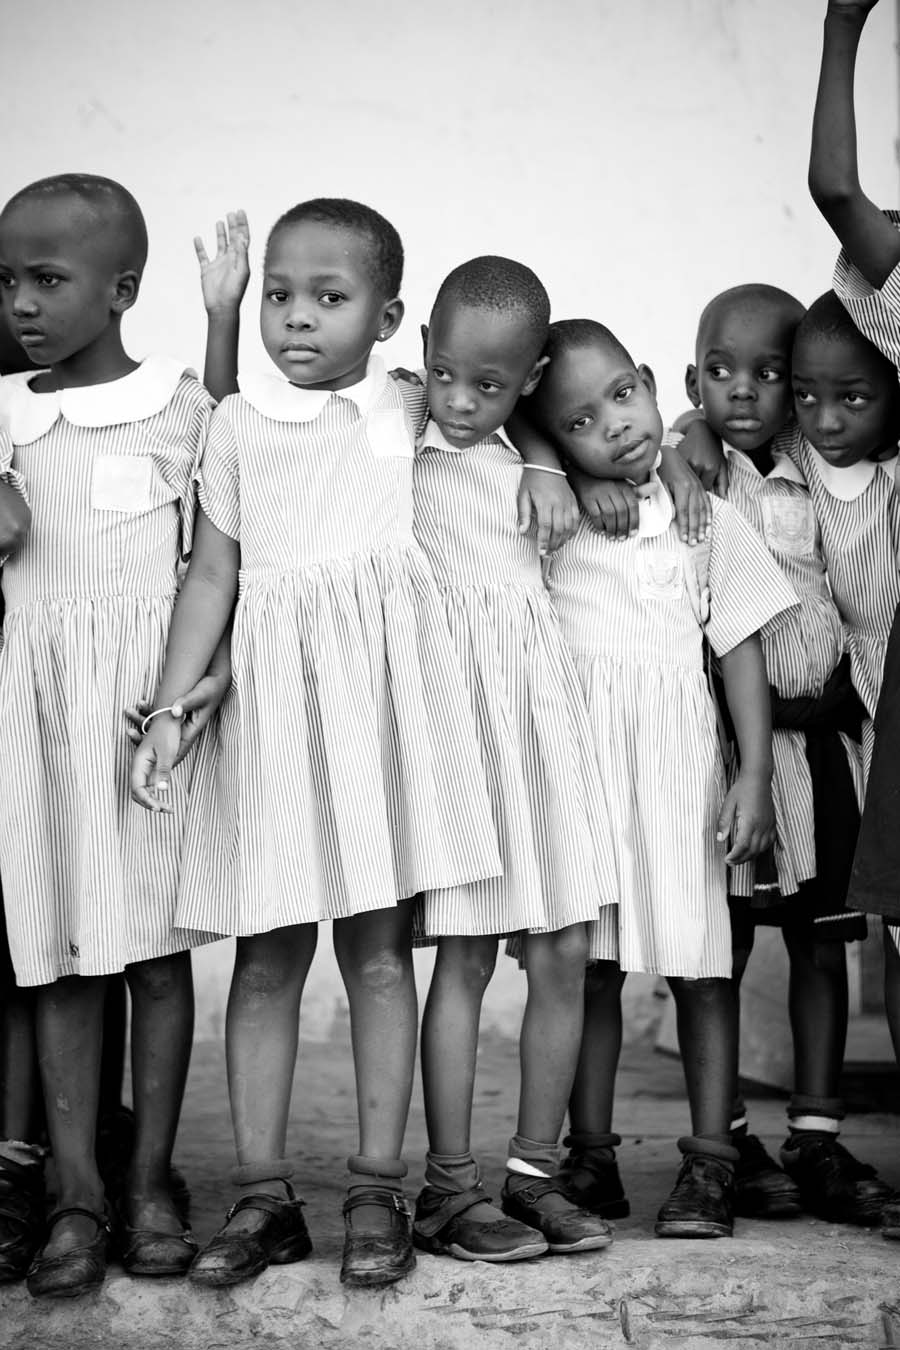 jessicadavisphotography.com | Jessica Davis Photography | Portrait Work in Uganda| Travel Photographer | World Event Photographs 4 (9).jpg